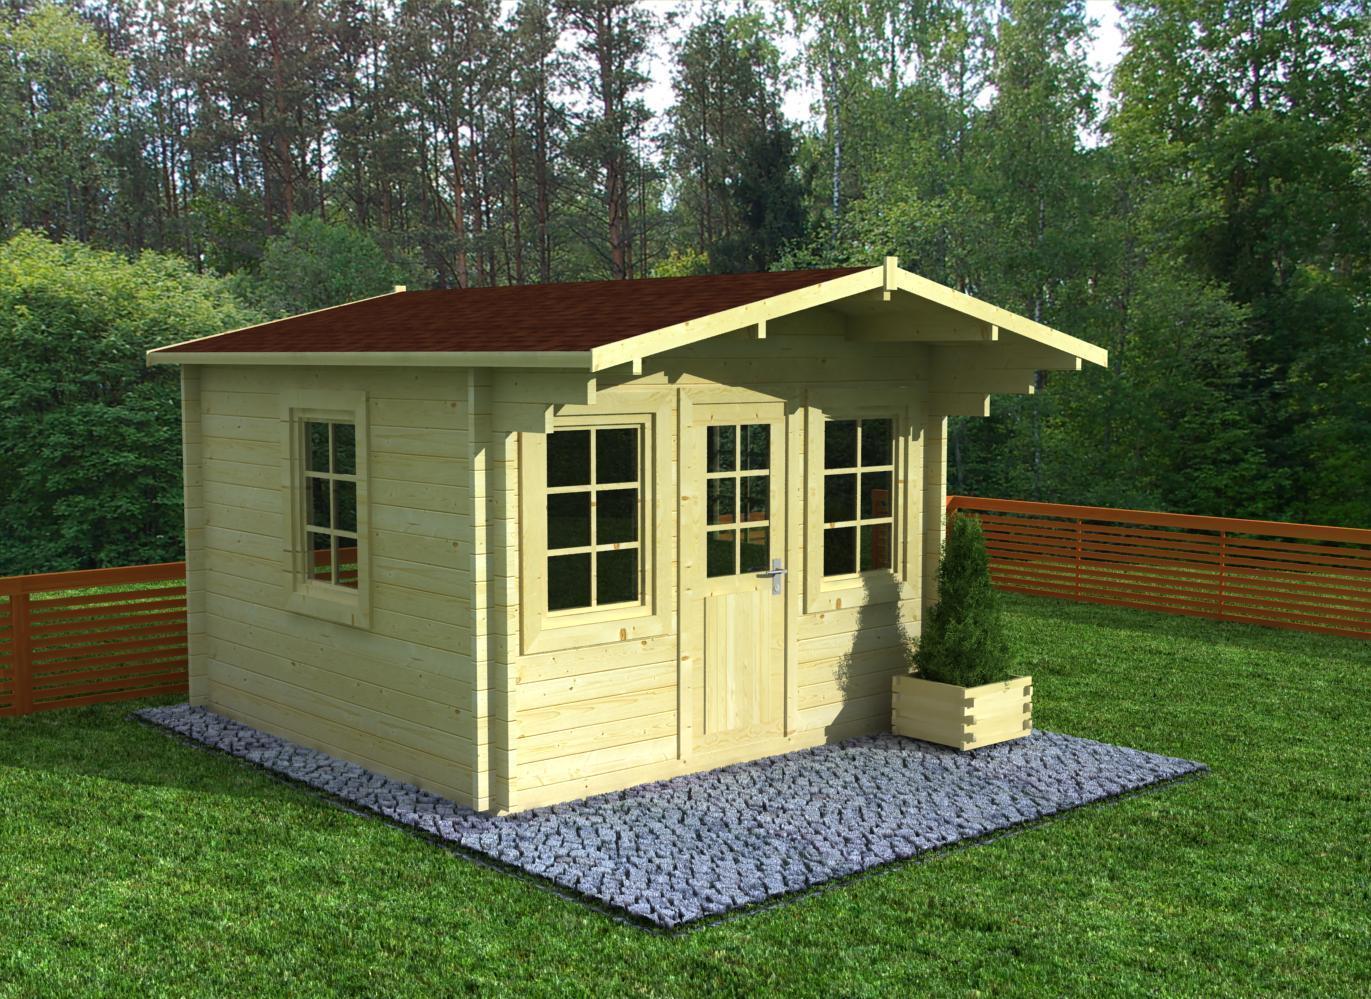 gartenhaus modell flensburg 44 sams gartenhaus shop. Black Bedroom Furniture Sets. Home Design Ideas